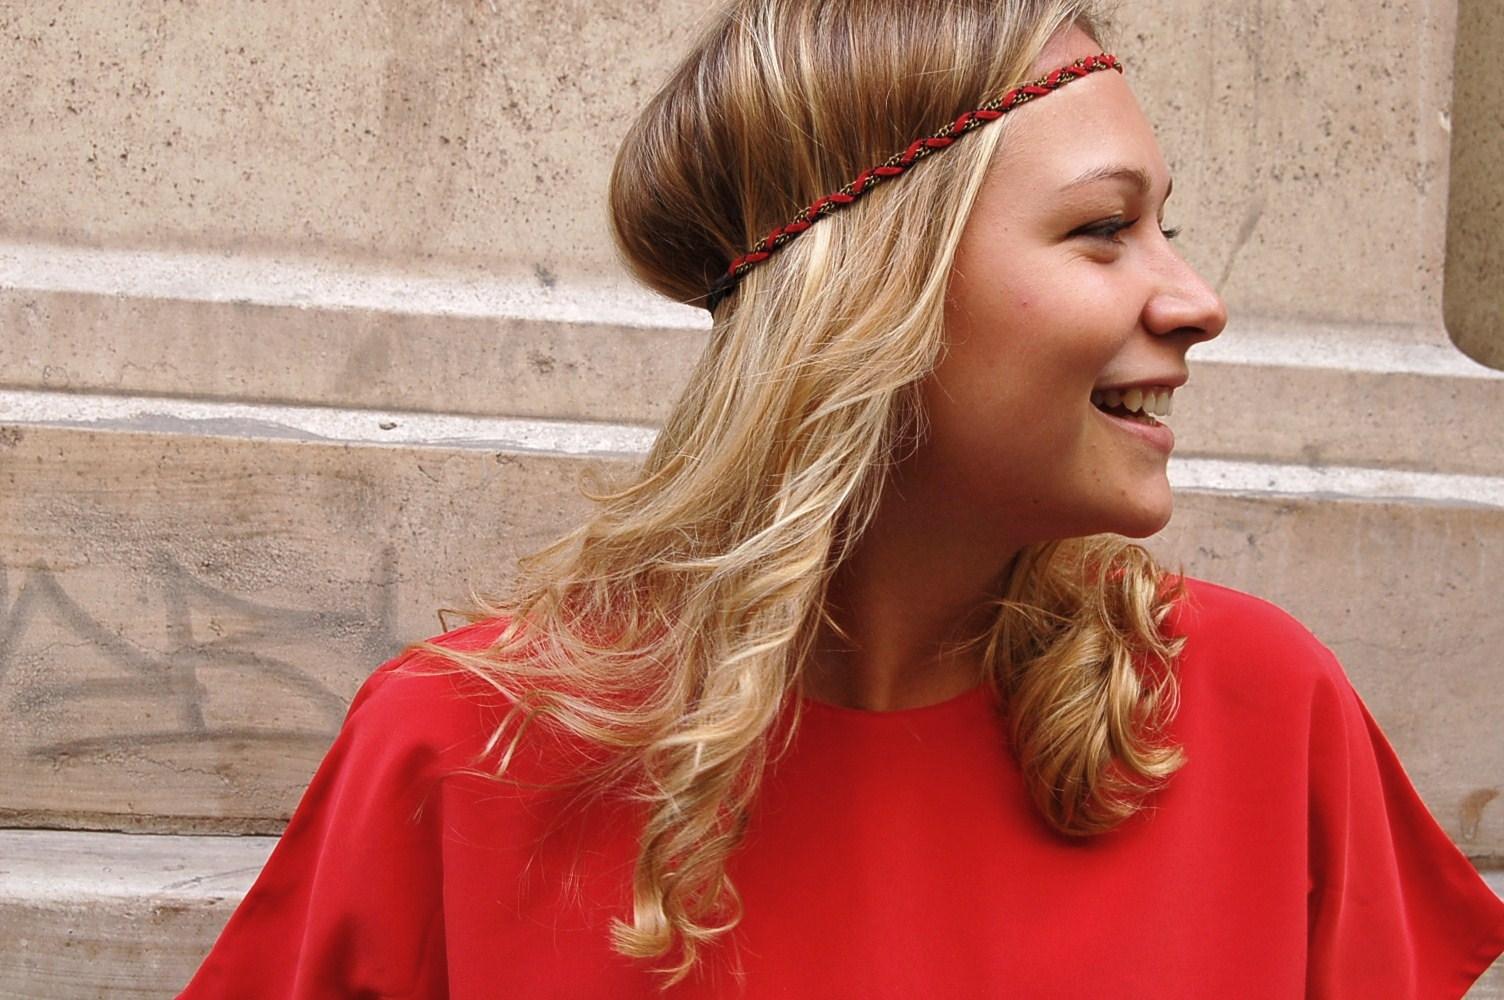 headband chouette fille